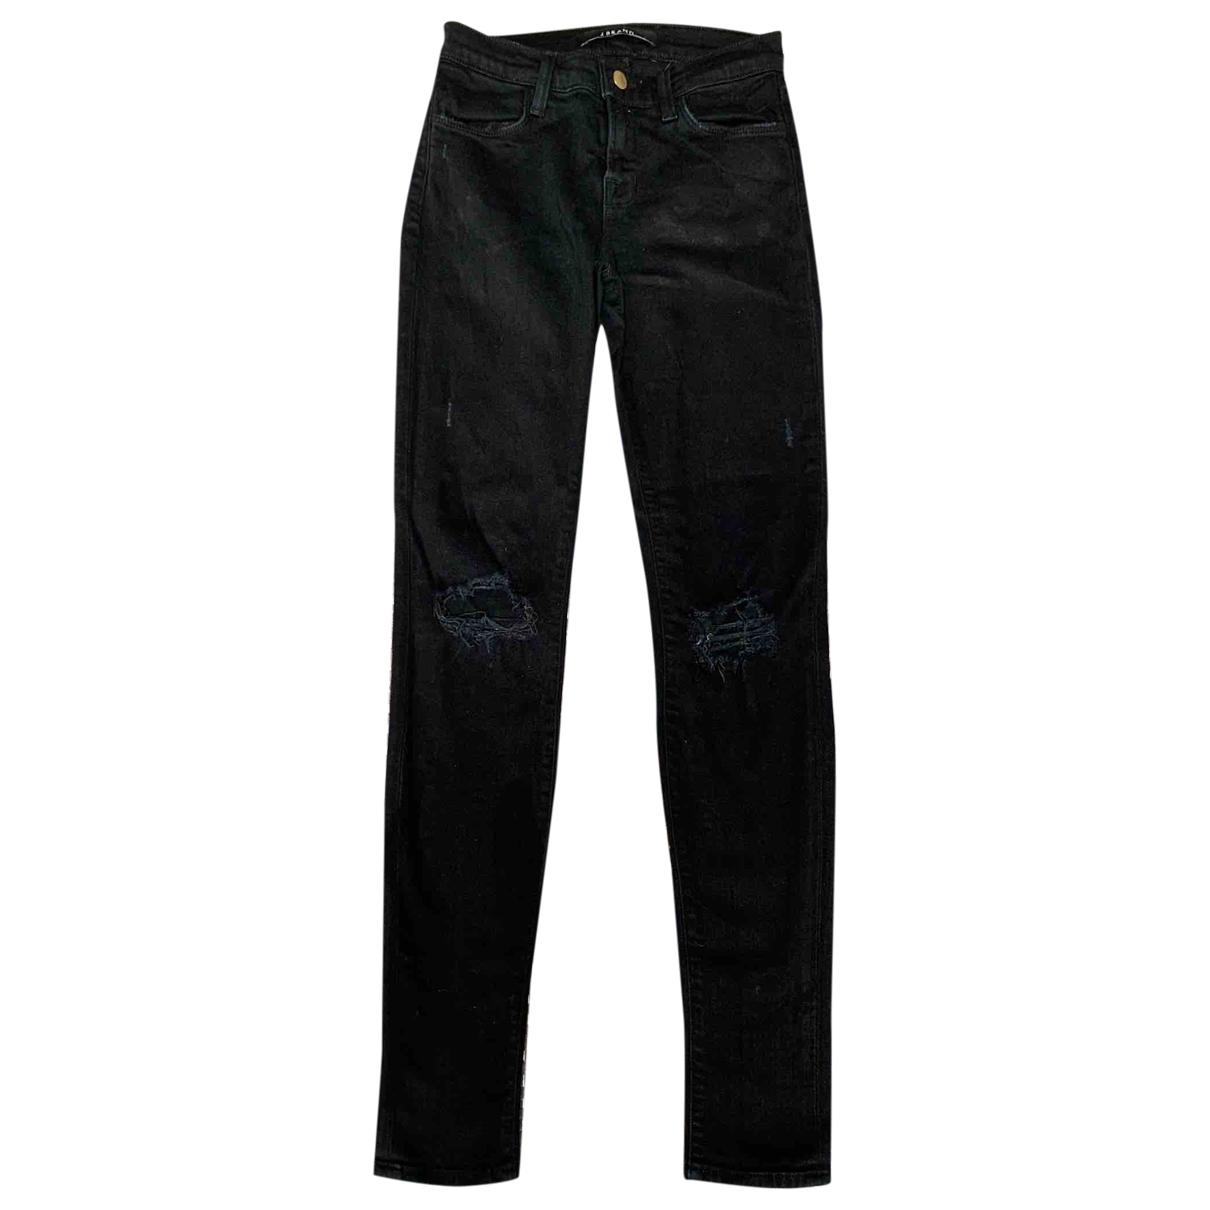 J Brand \N Black Cotton - elasthane Jeans for Women 25 US